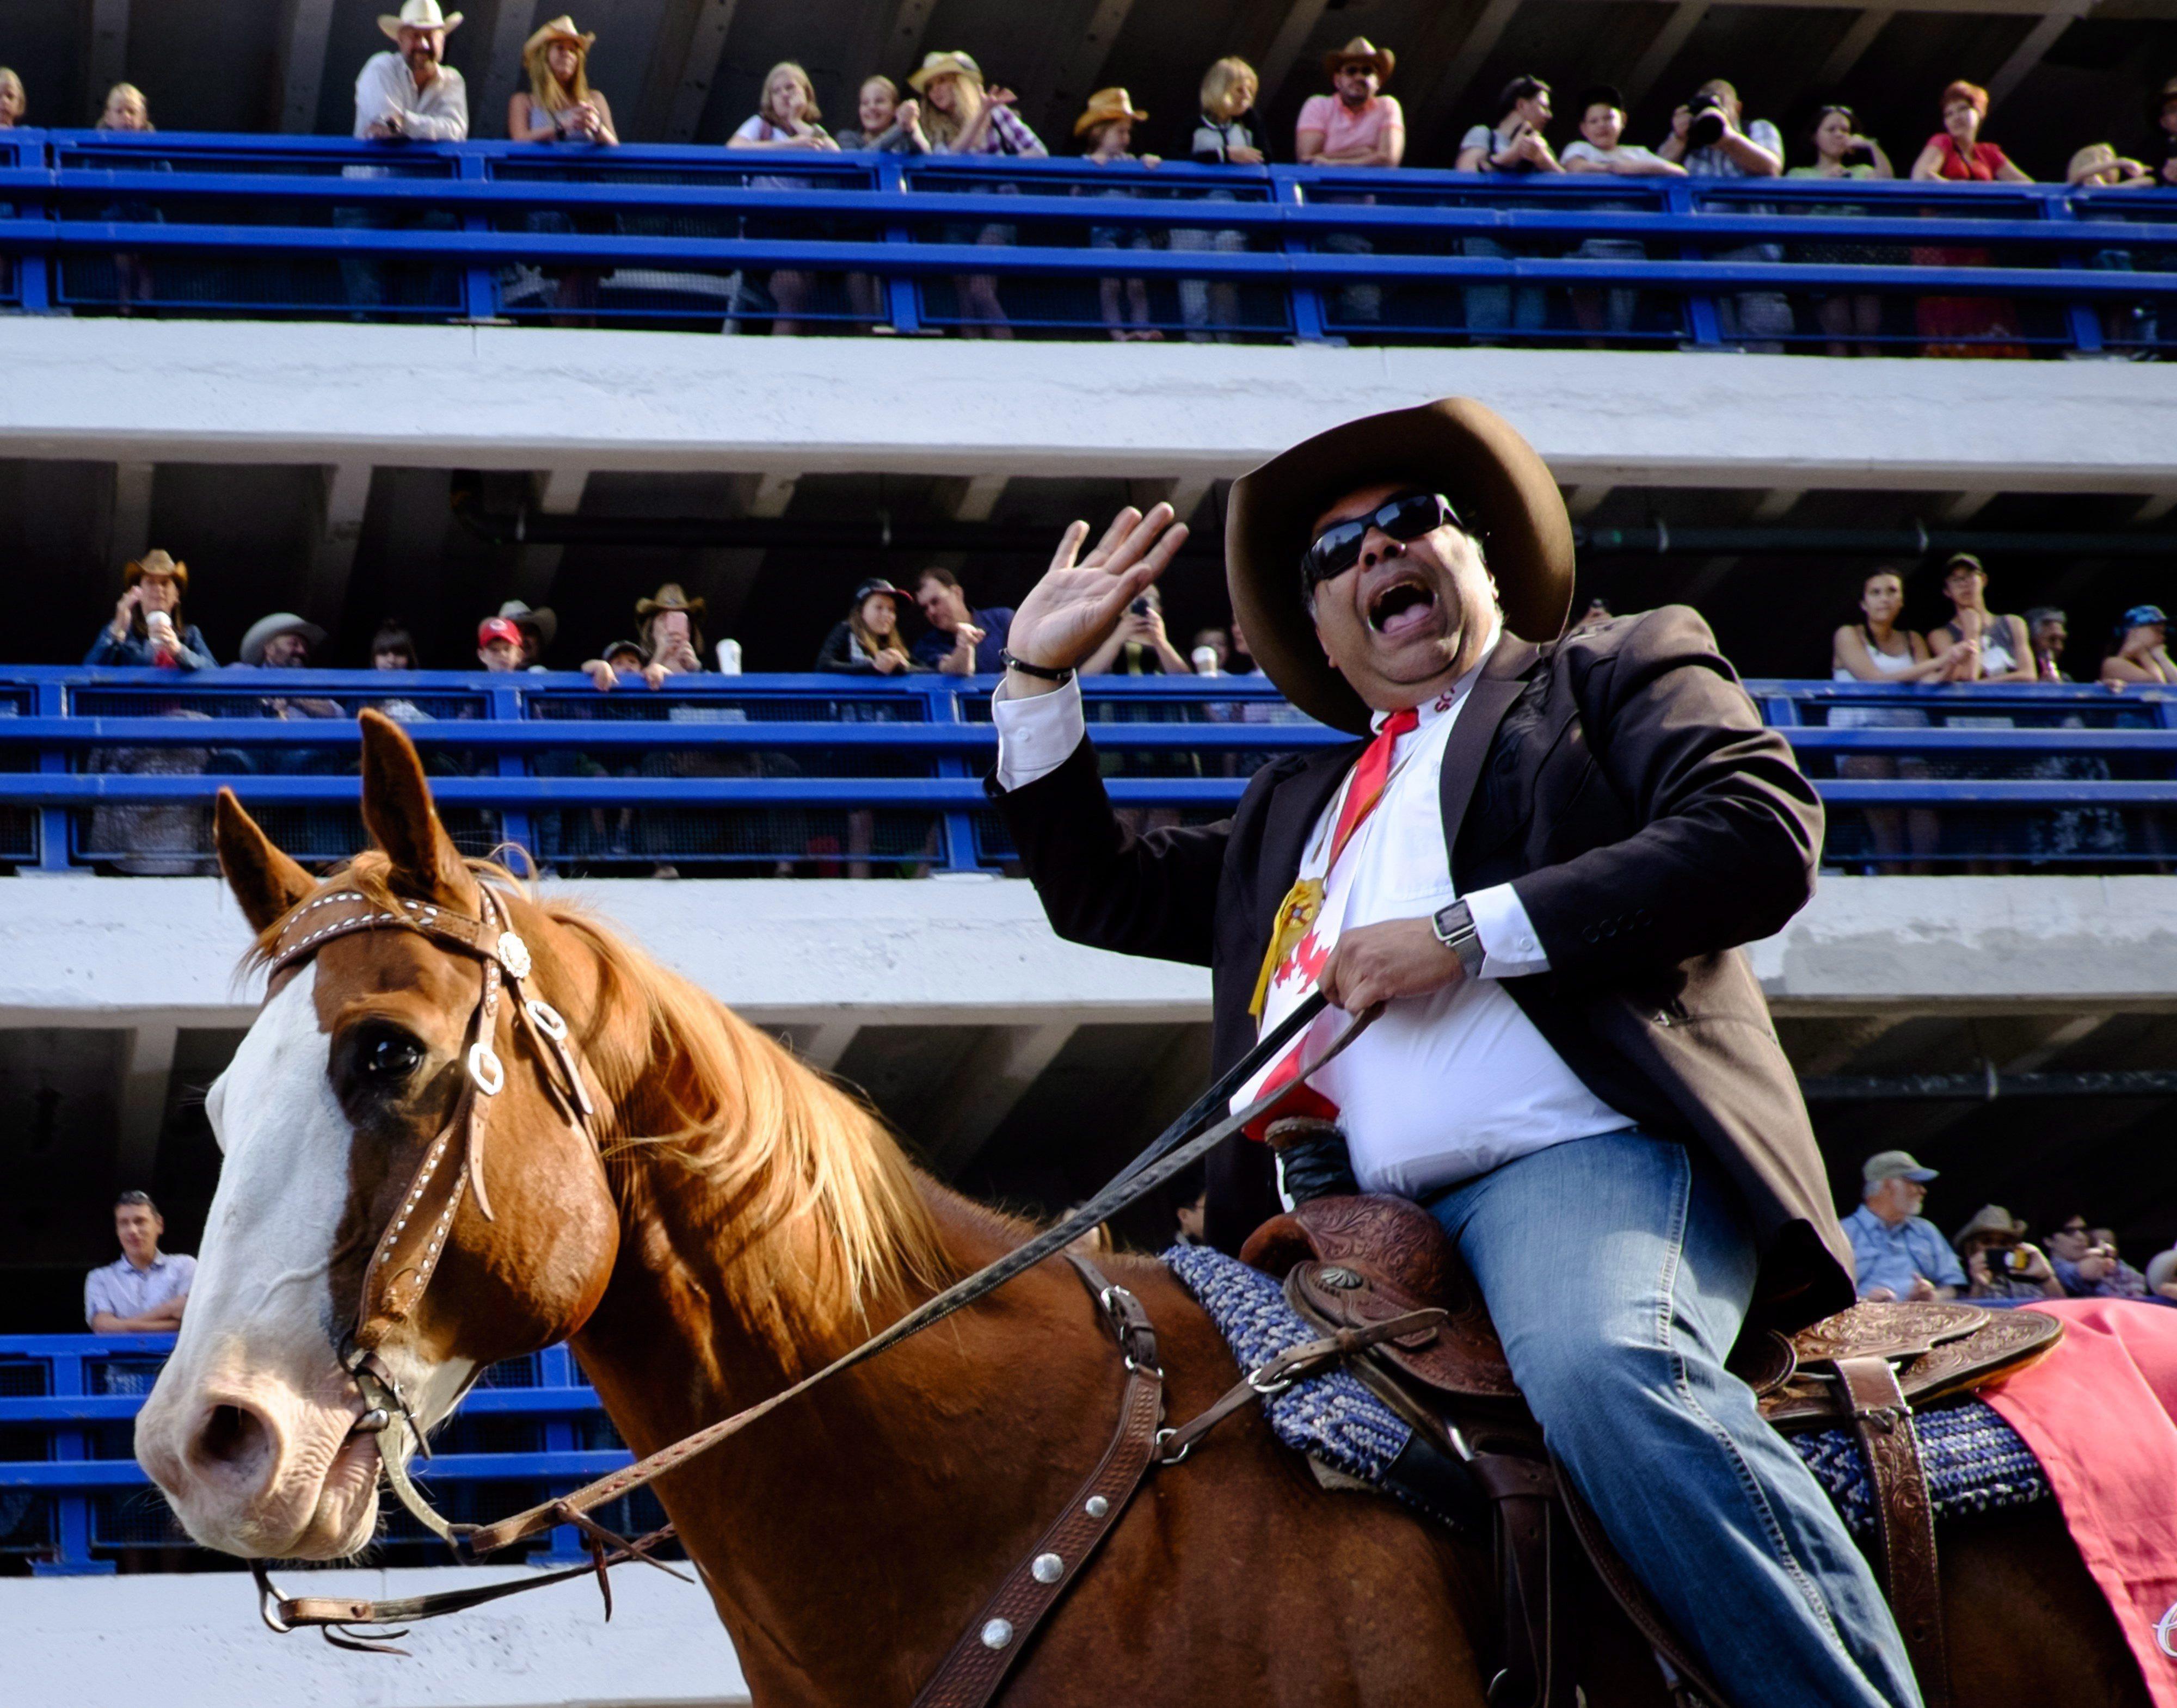 Calgary Mayor Naheed Nenshi rides a horse during the Calgary Stampede parade in Calgary, Friday, July...